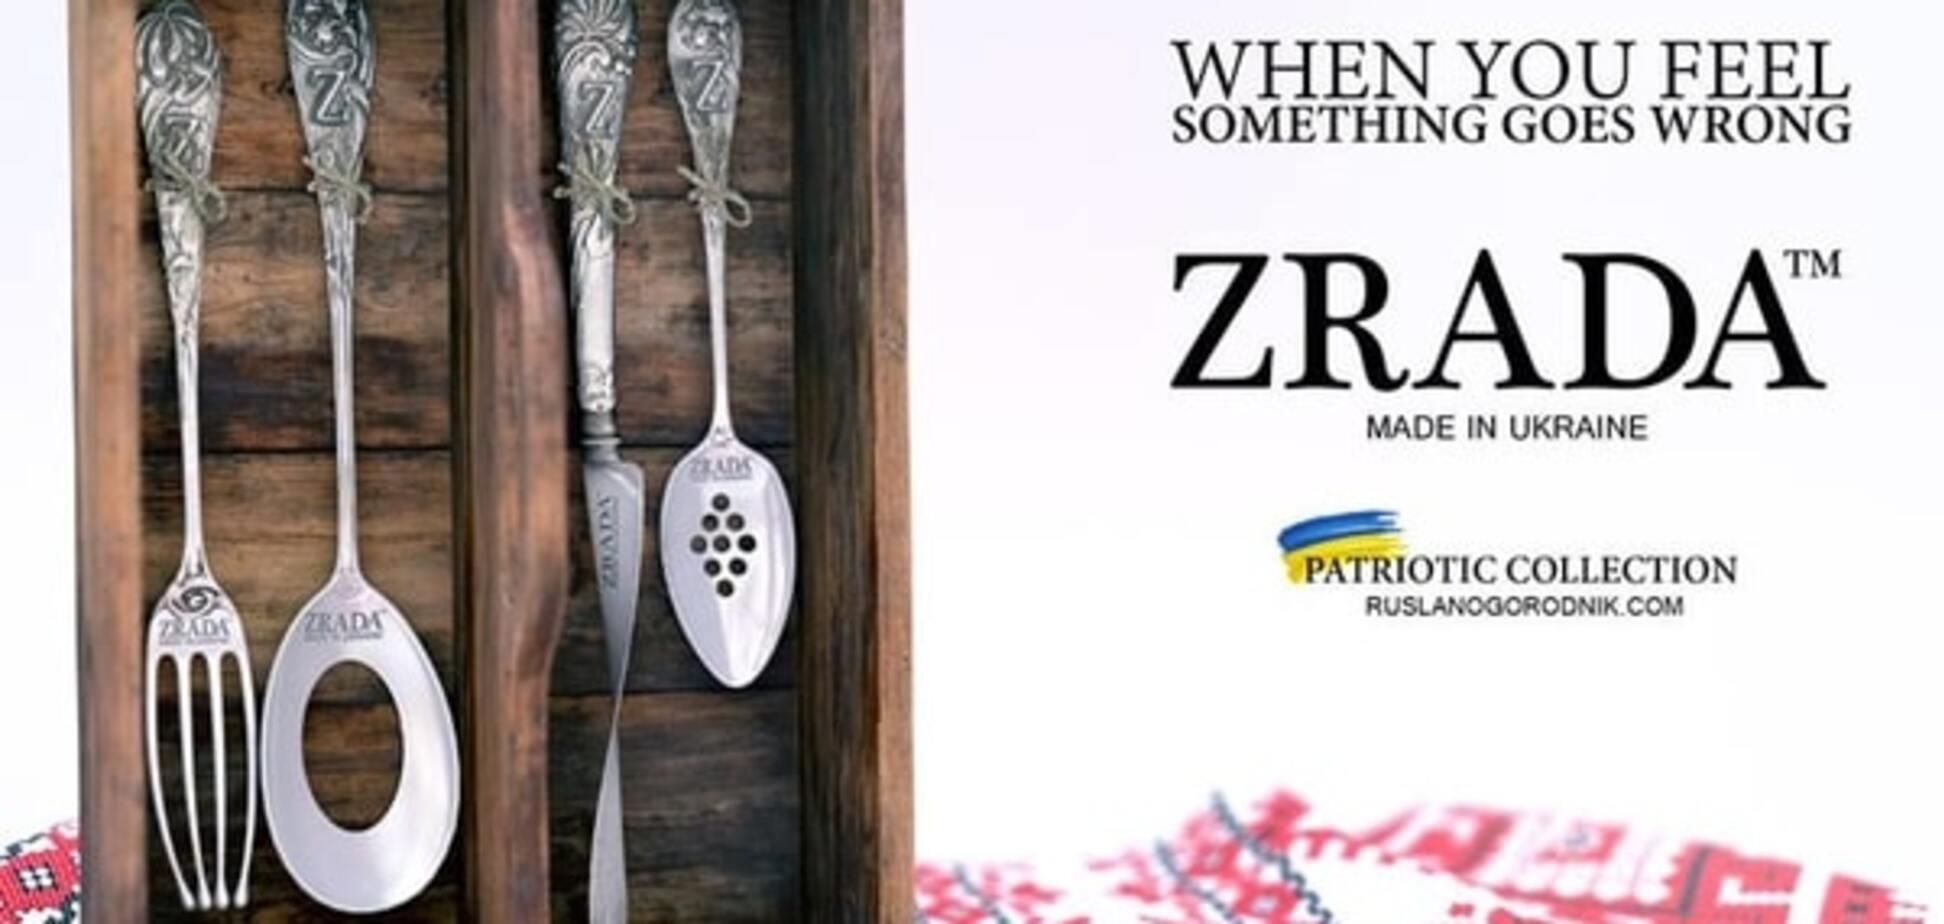 'Пороблено в Україні': дизайнер створив патріотично-депресивну колекцію 'ZRADA' ТМ. Фотофакт